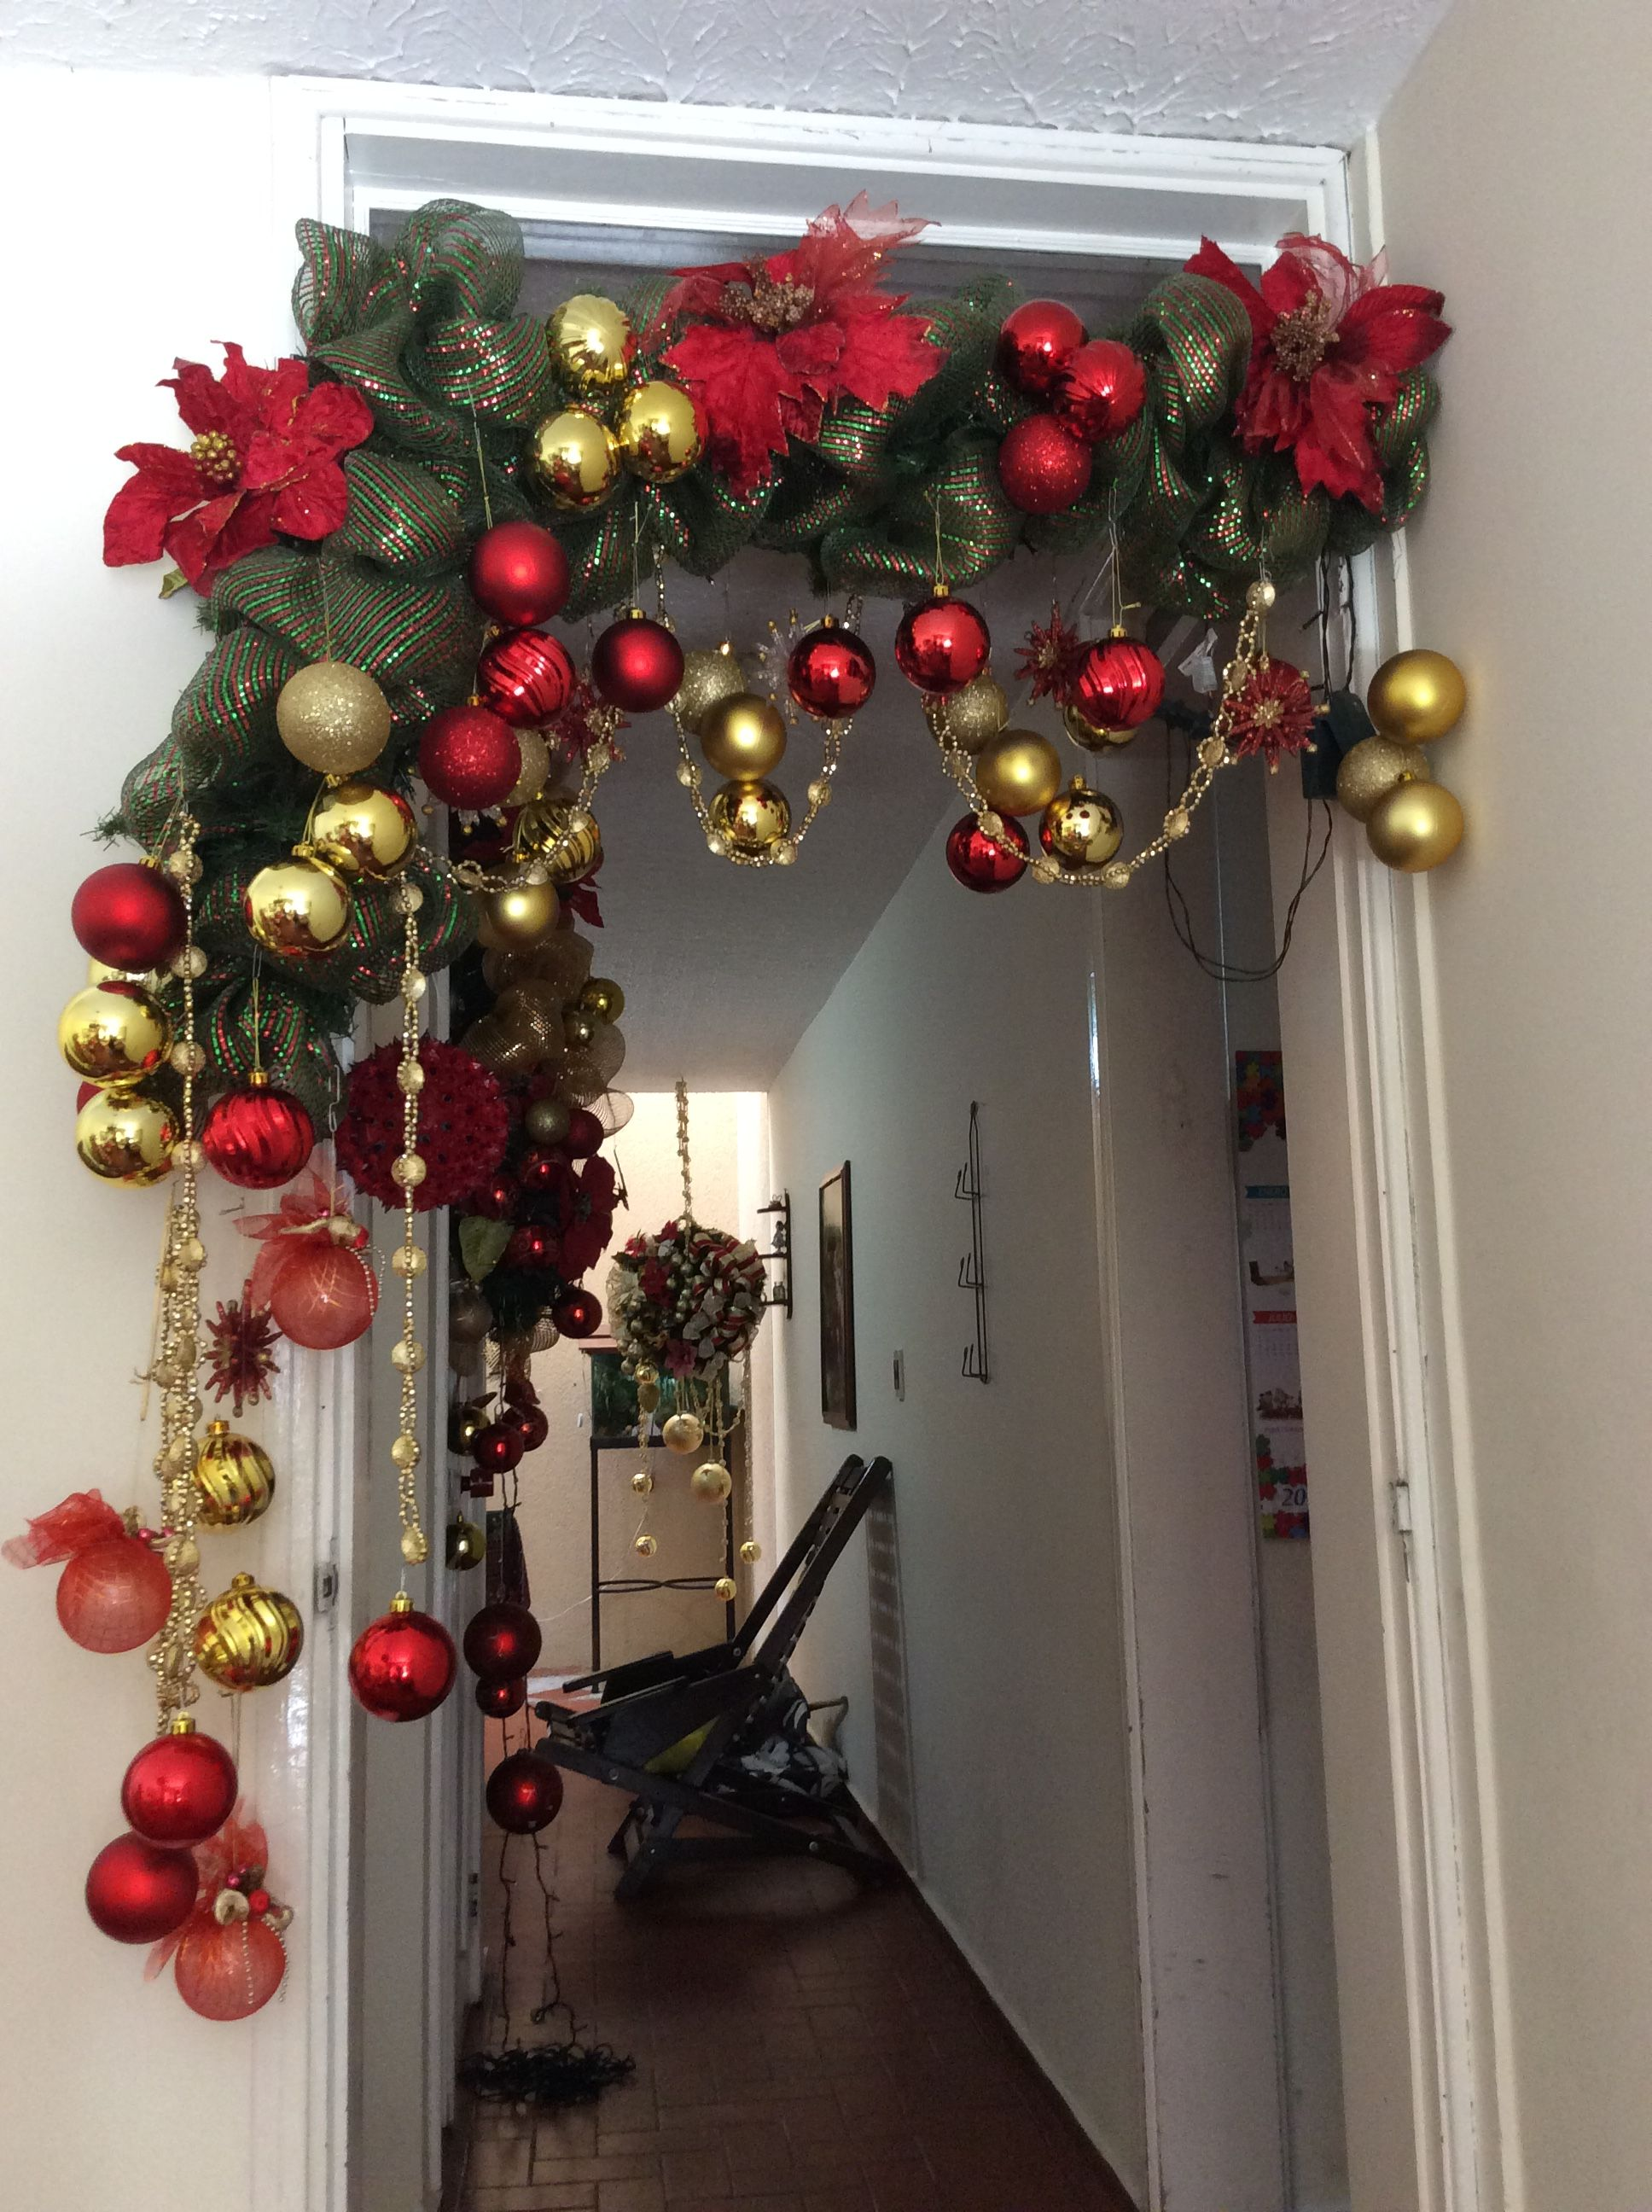 arreglo avatar xmas pinterest weihnachtsdekoration weihnachten und weihnachtsdekoration. Black Bedroom Furniture Sets. Home Design Ideas